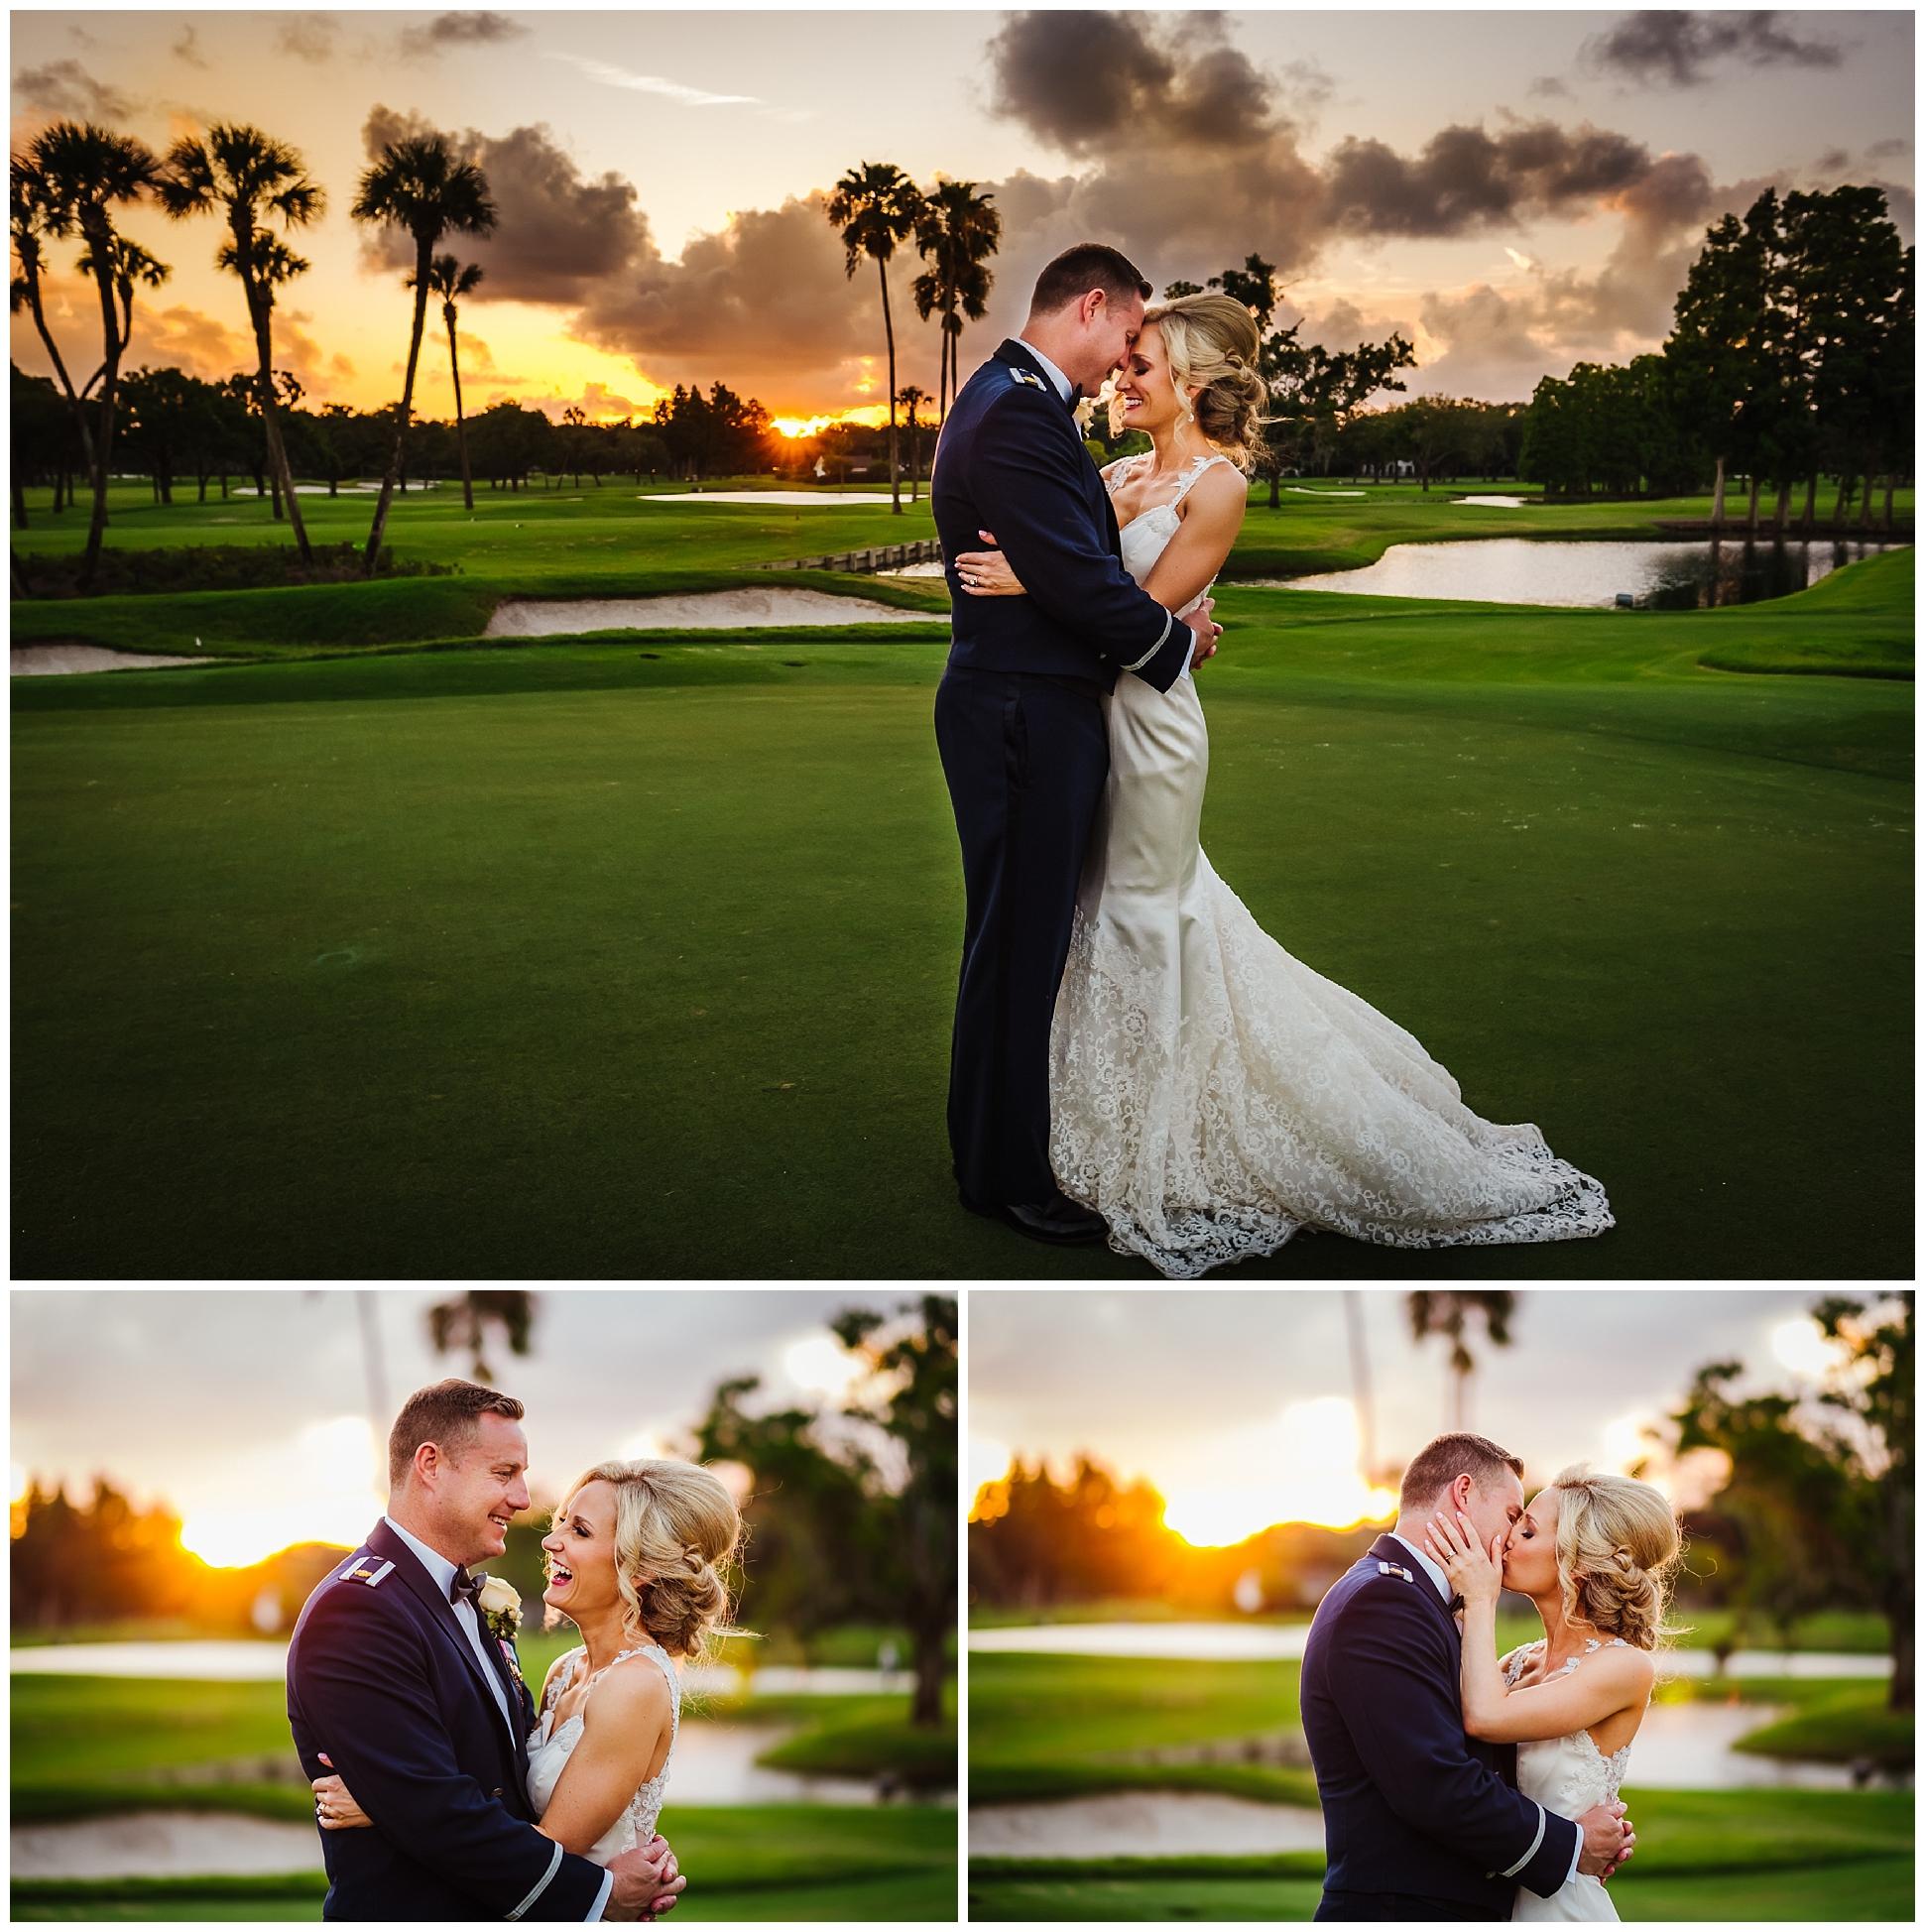 tampa-wedding-photographer-sleeves-palma-ceia-country-club-golf-course-sunset-luxury_0099.jpg